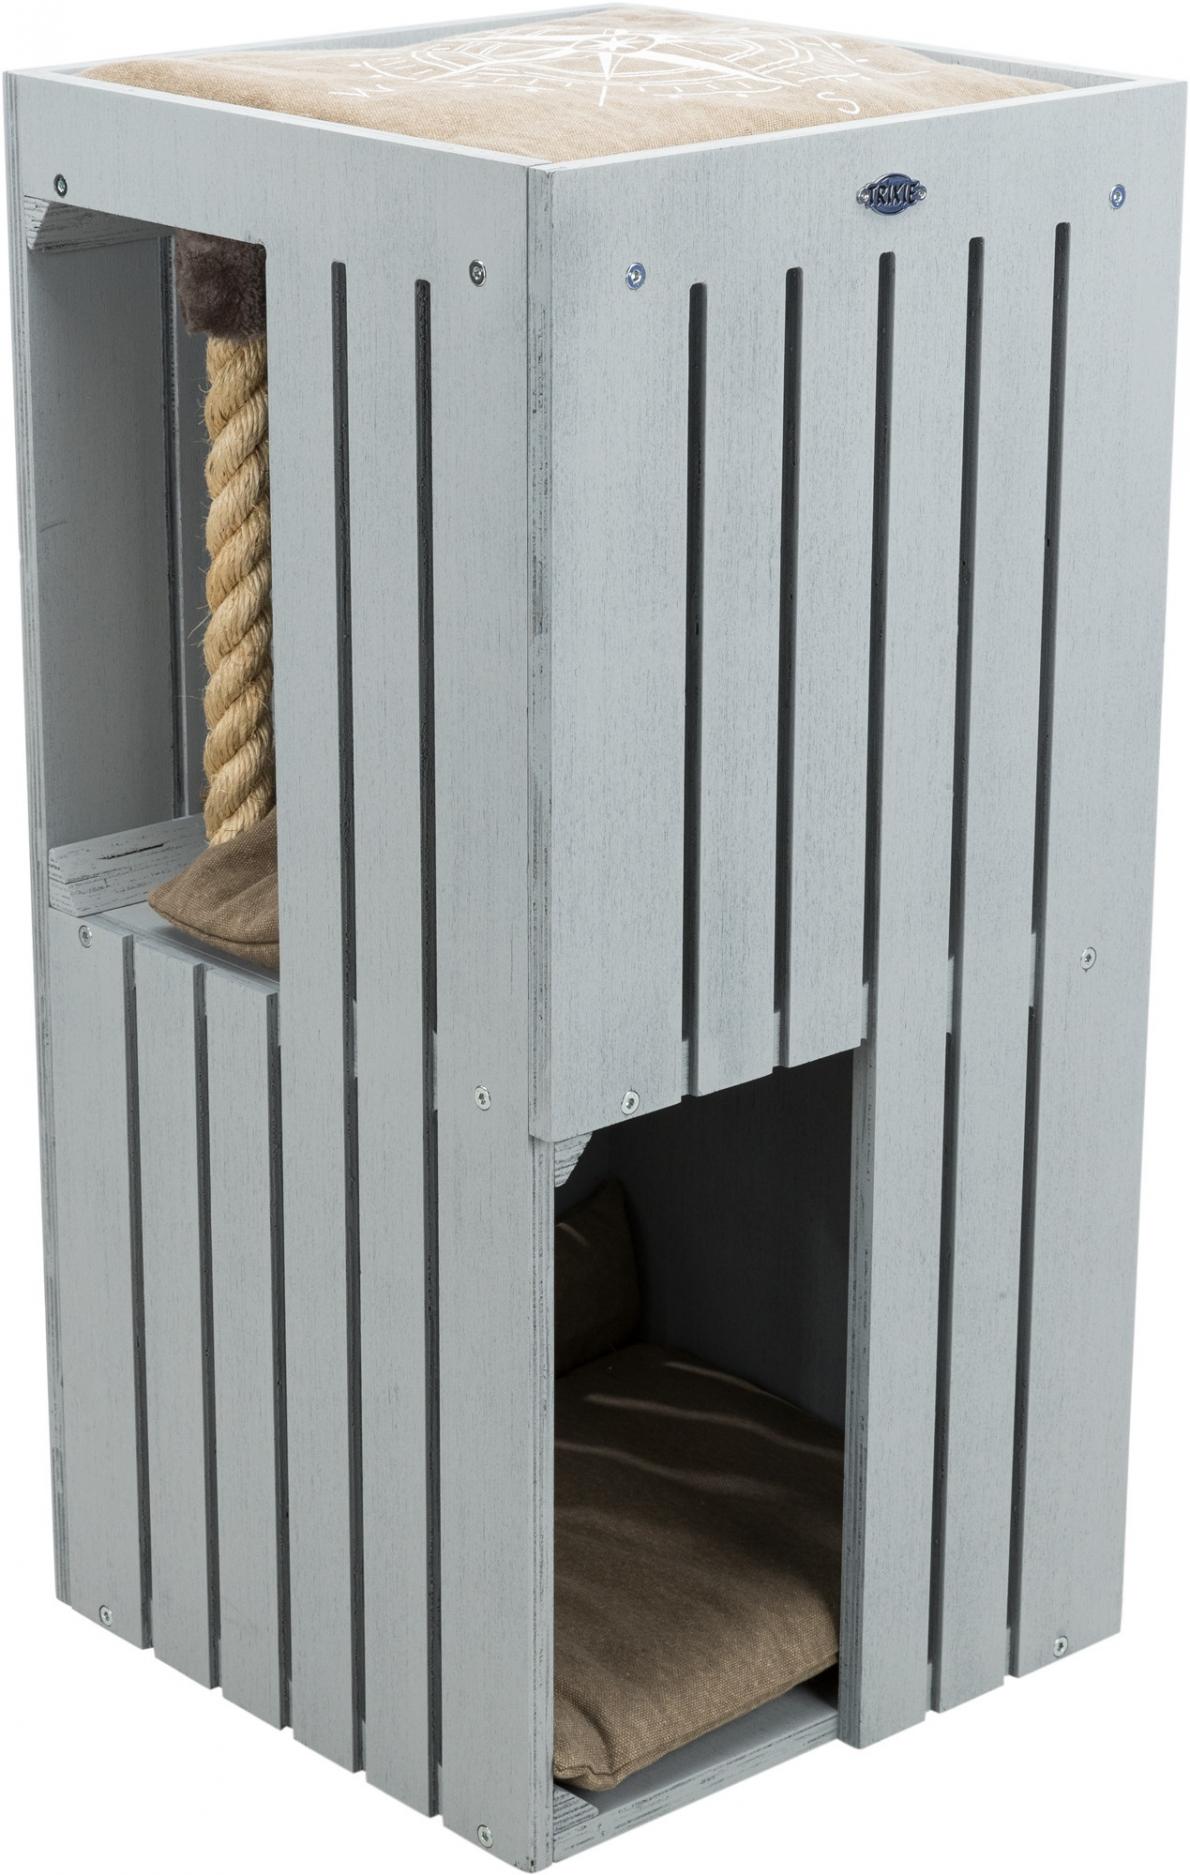 BE NORDIC Cat Tower Juna, 77 cm, grijs